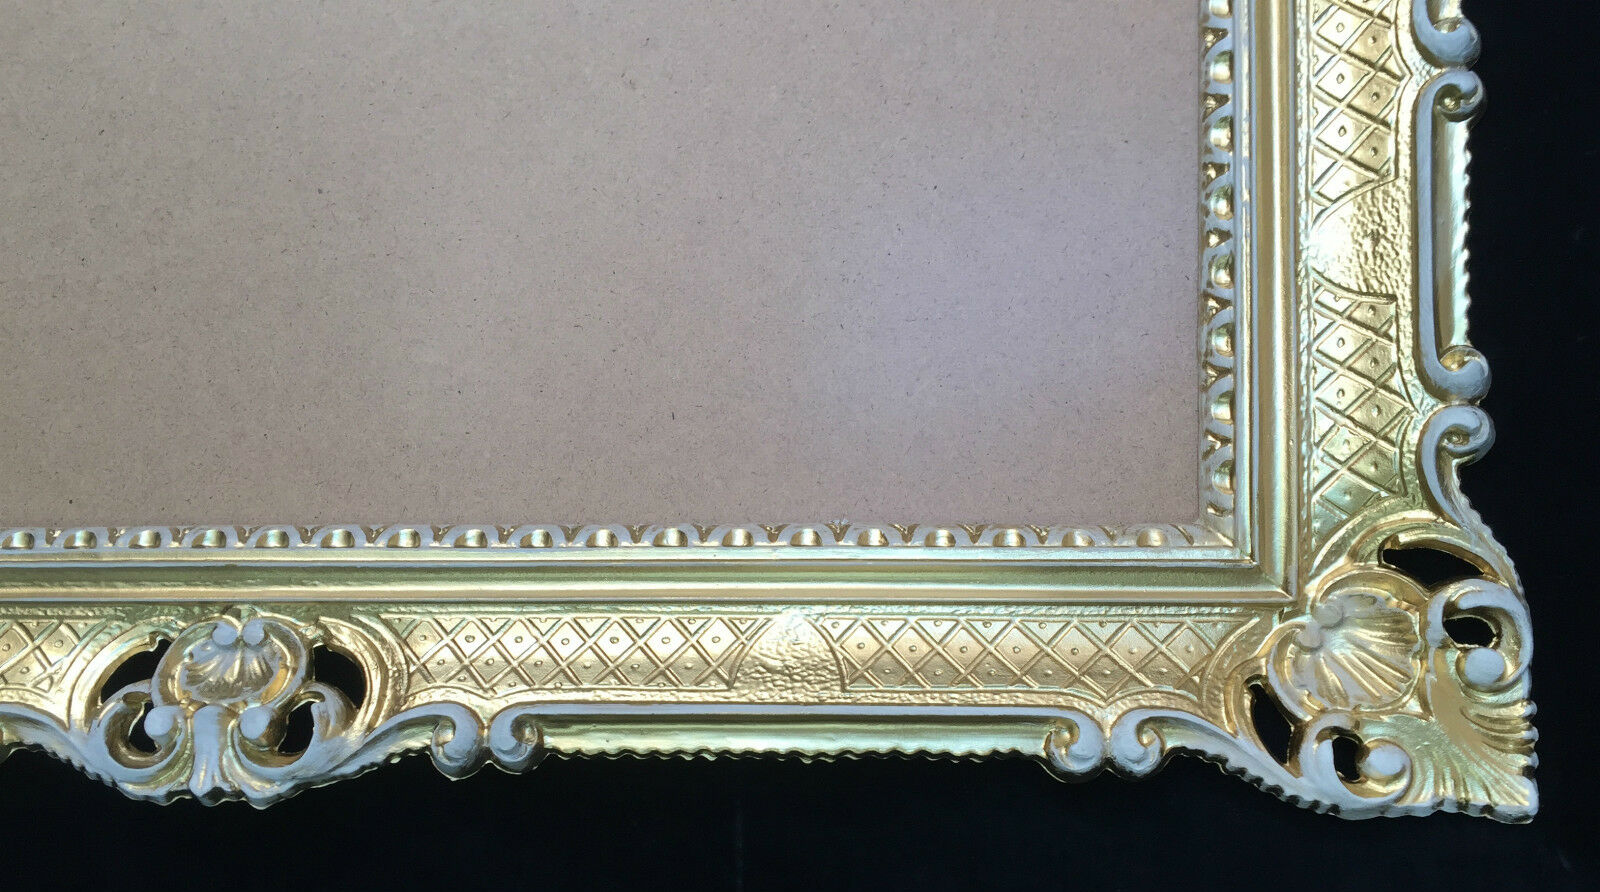 Cadre D'Image Or-Blanc Baroque Antique 90x70 Haut Grand Cadre Photo